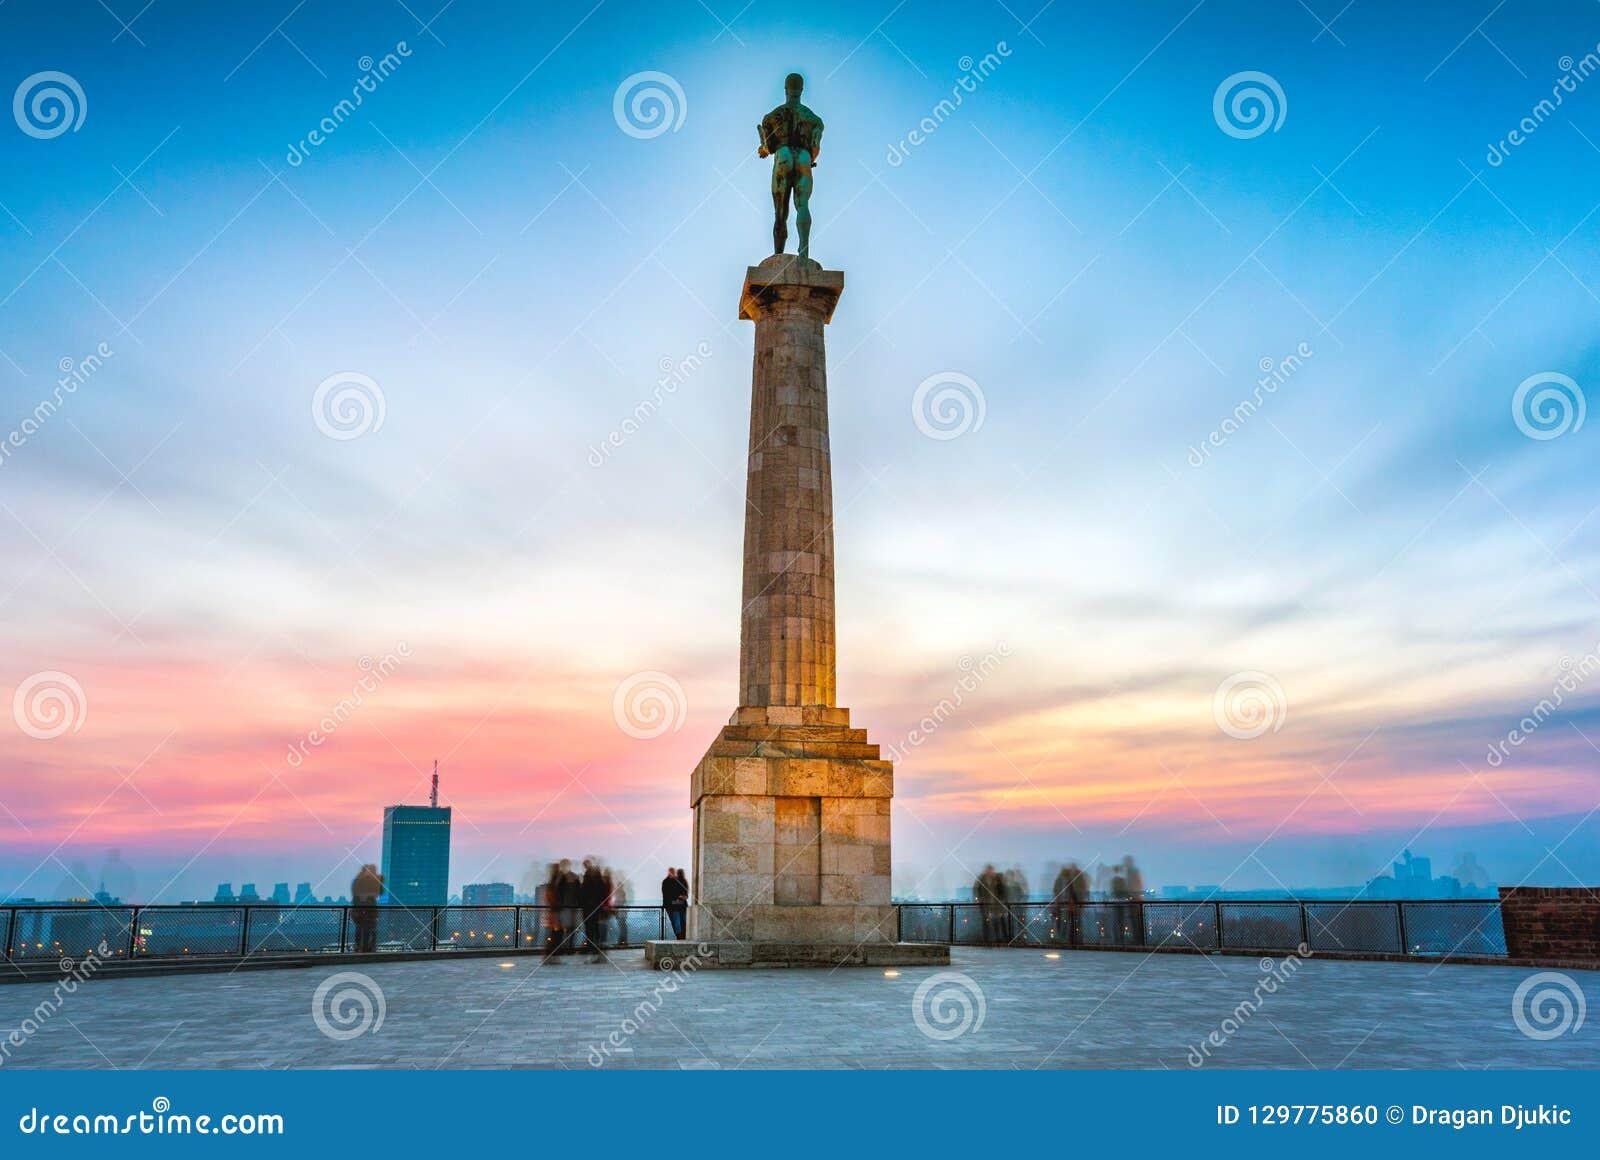 Belgrade at sunset. Pobednik statue